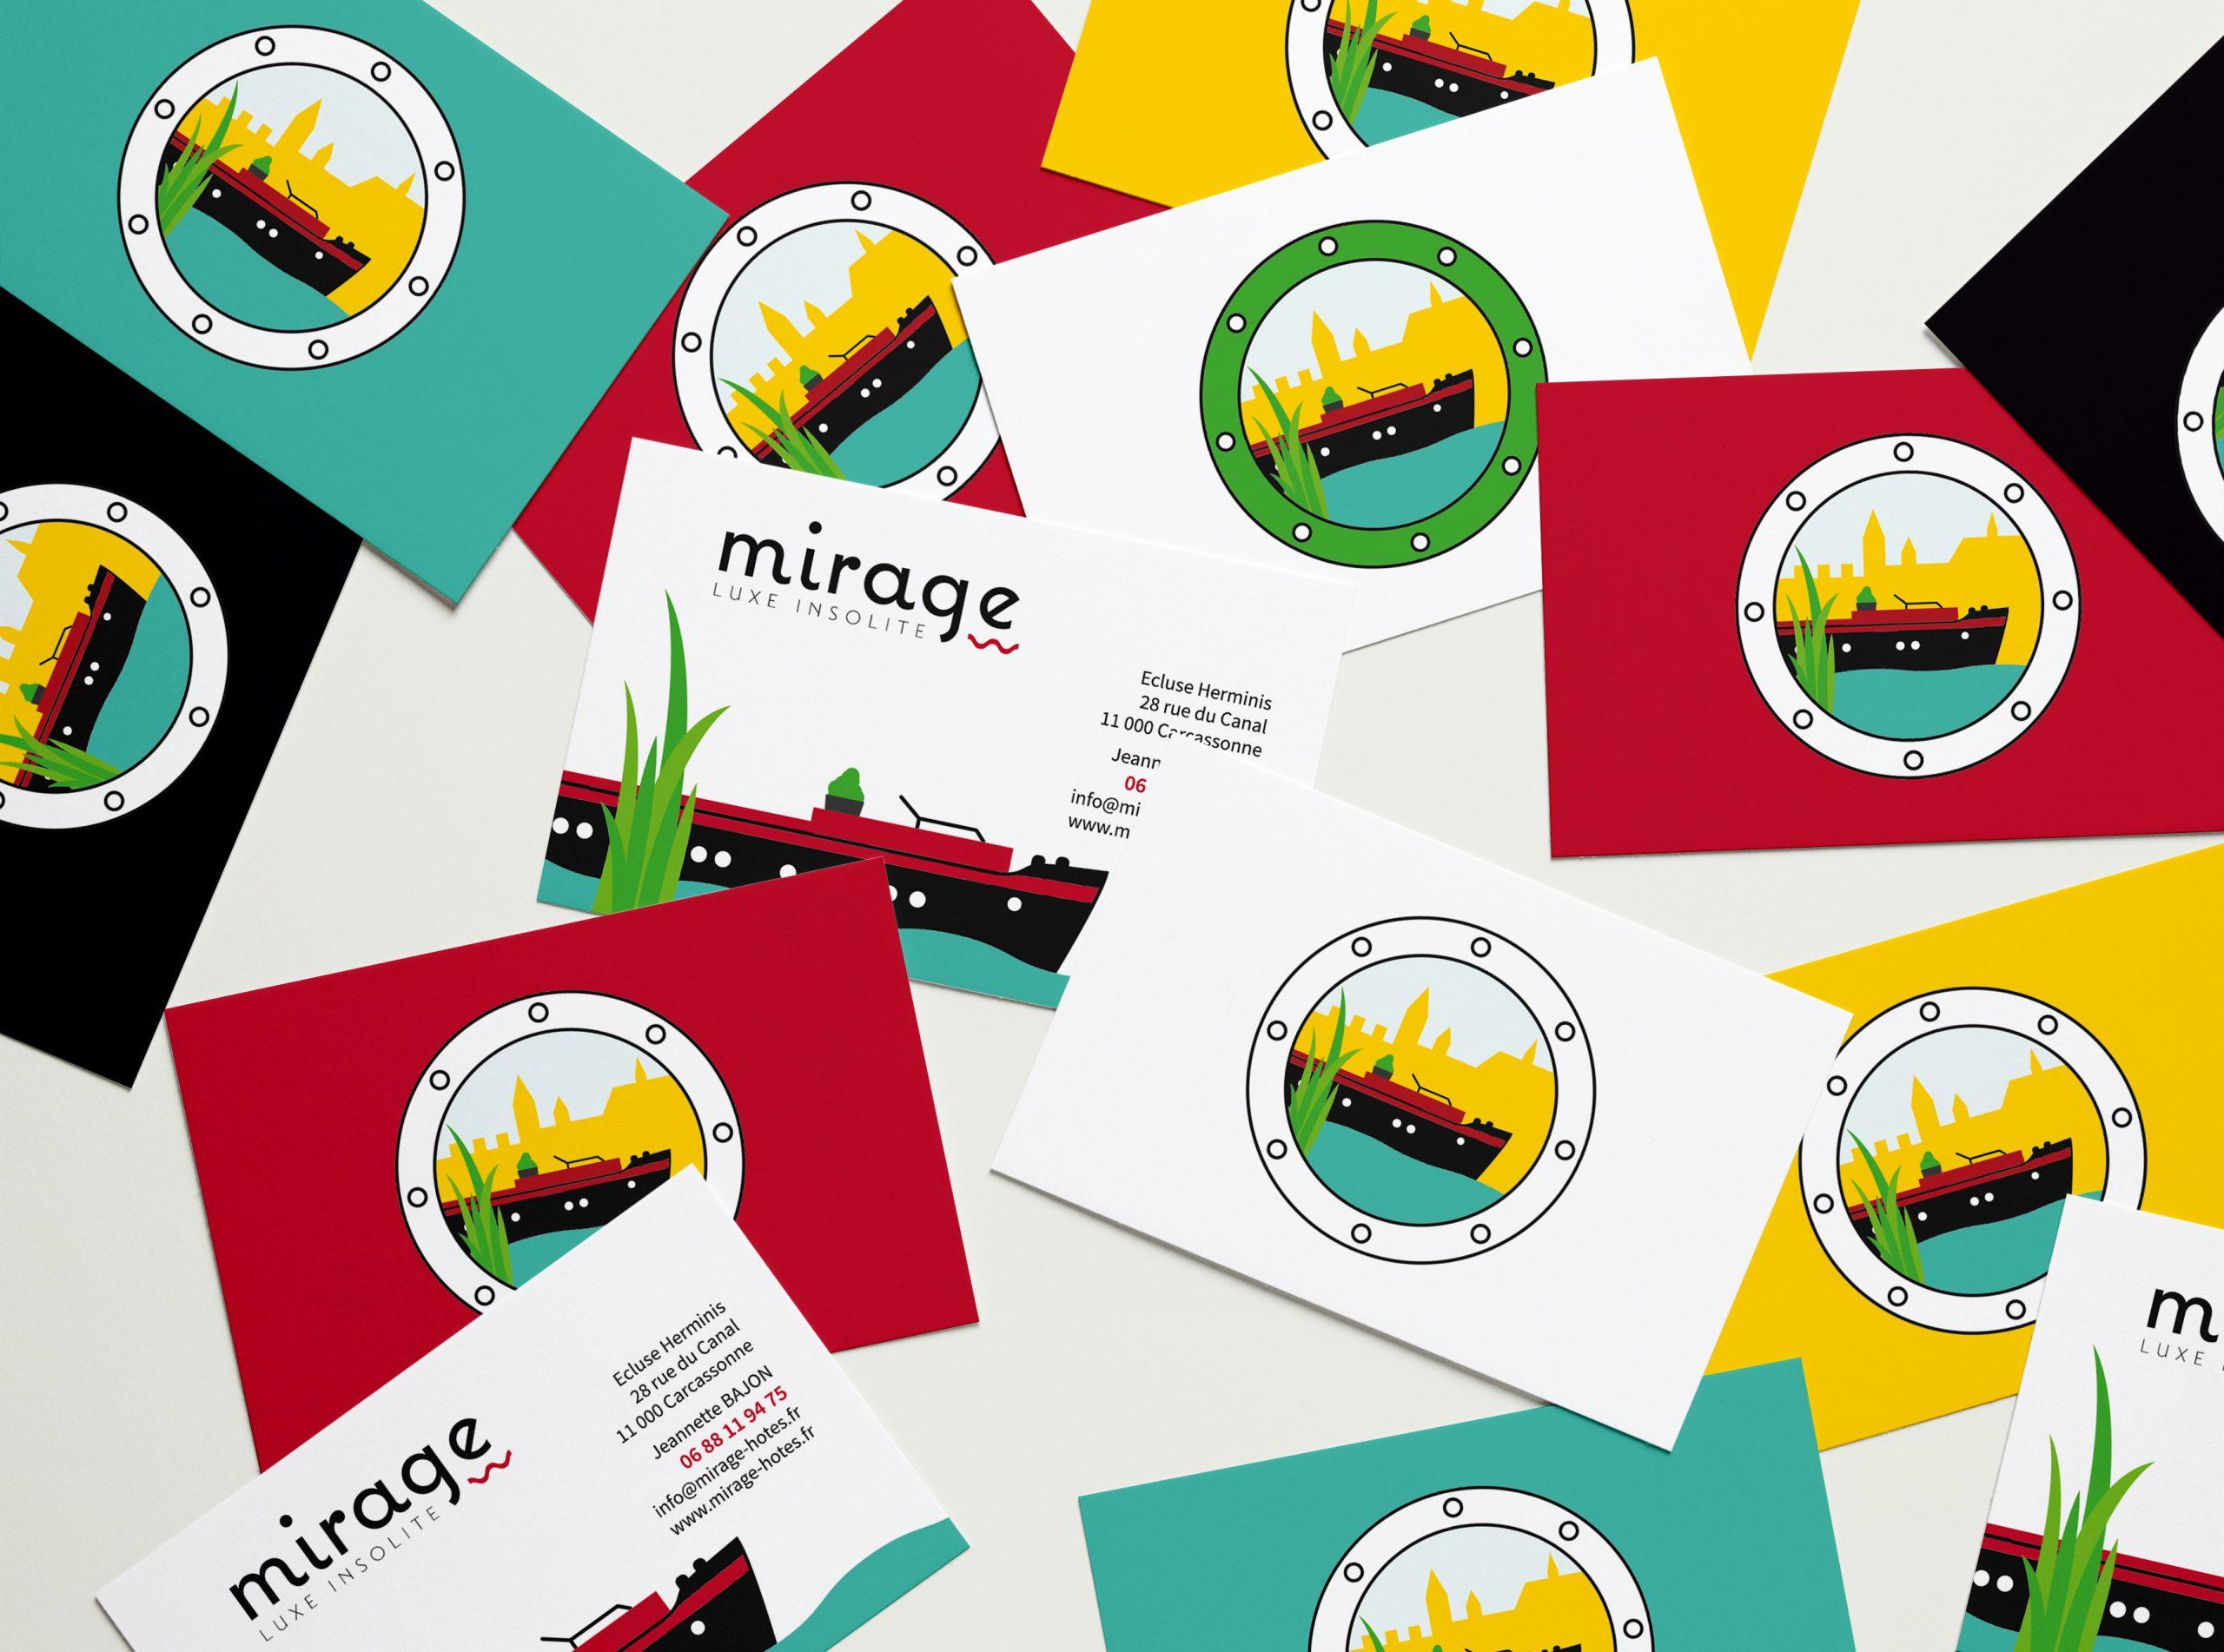 mirage flyer logo péniche identité visuelle